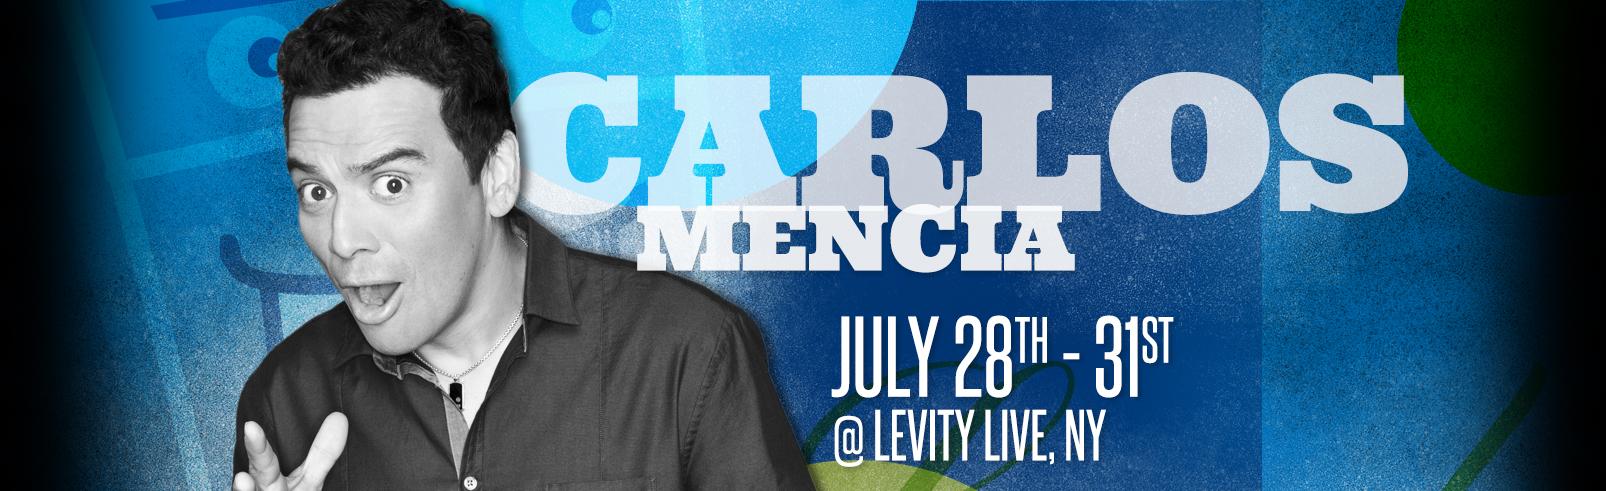 Carlos Mencia @ Levity Live